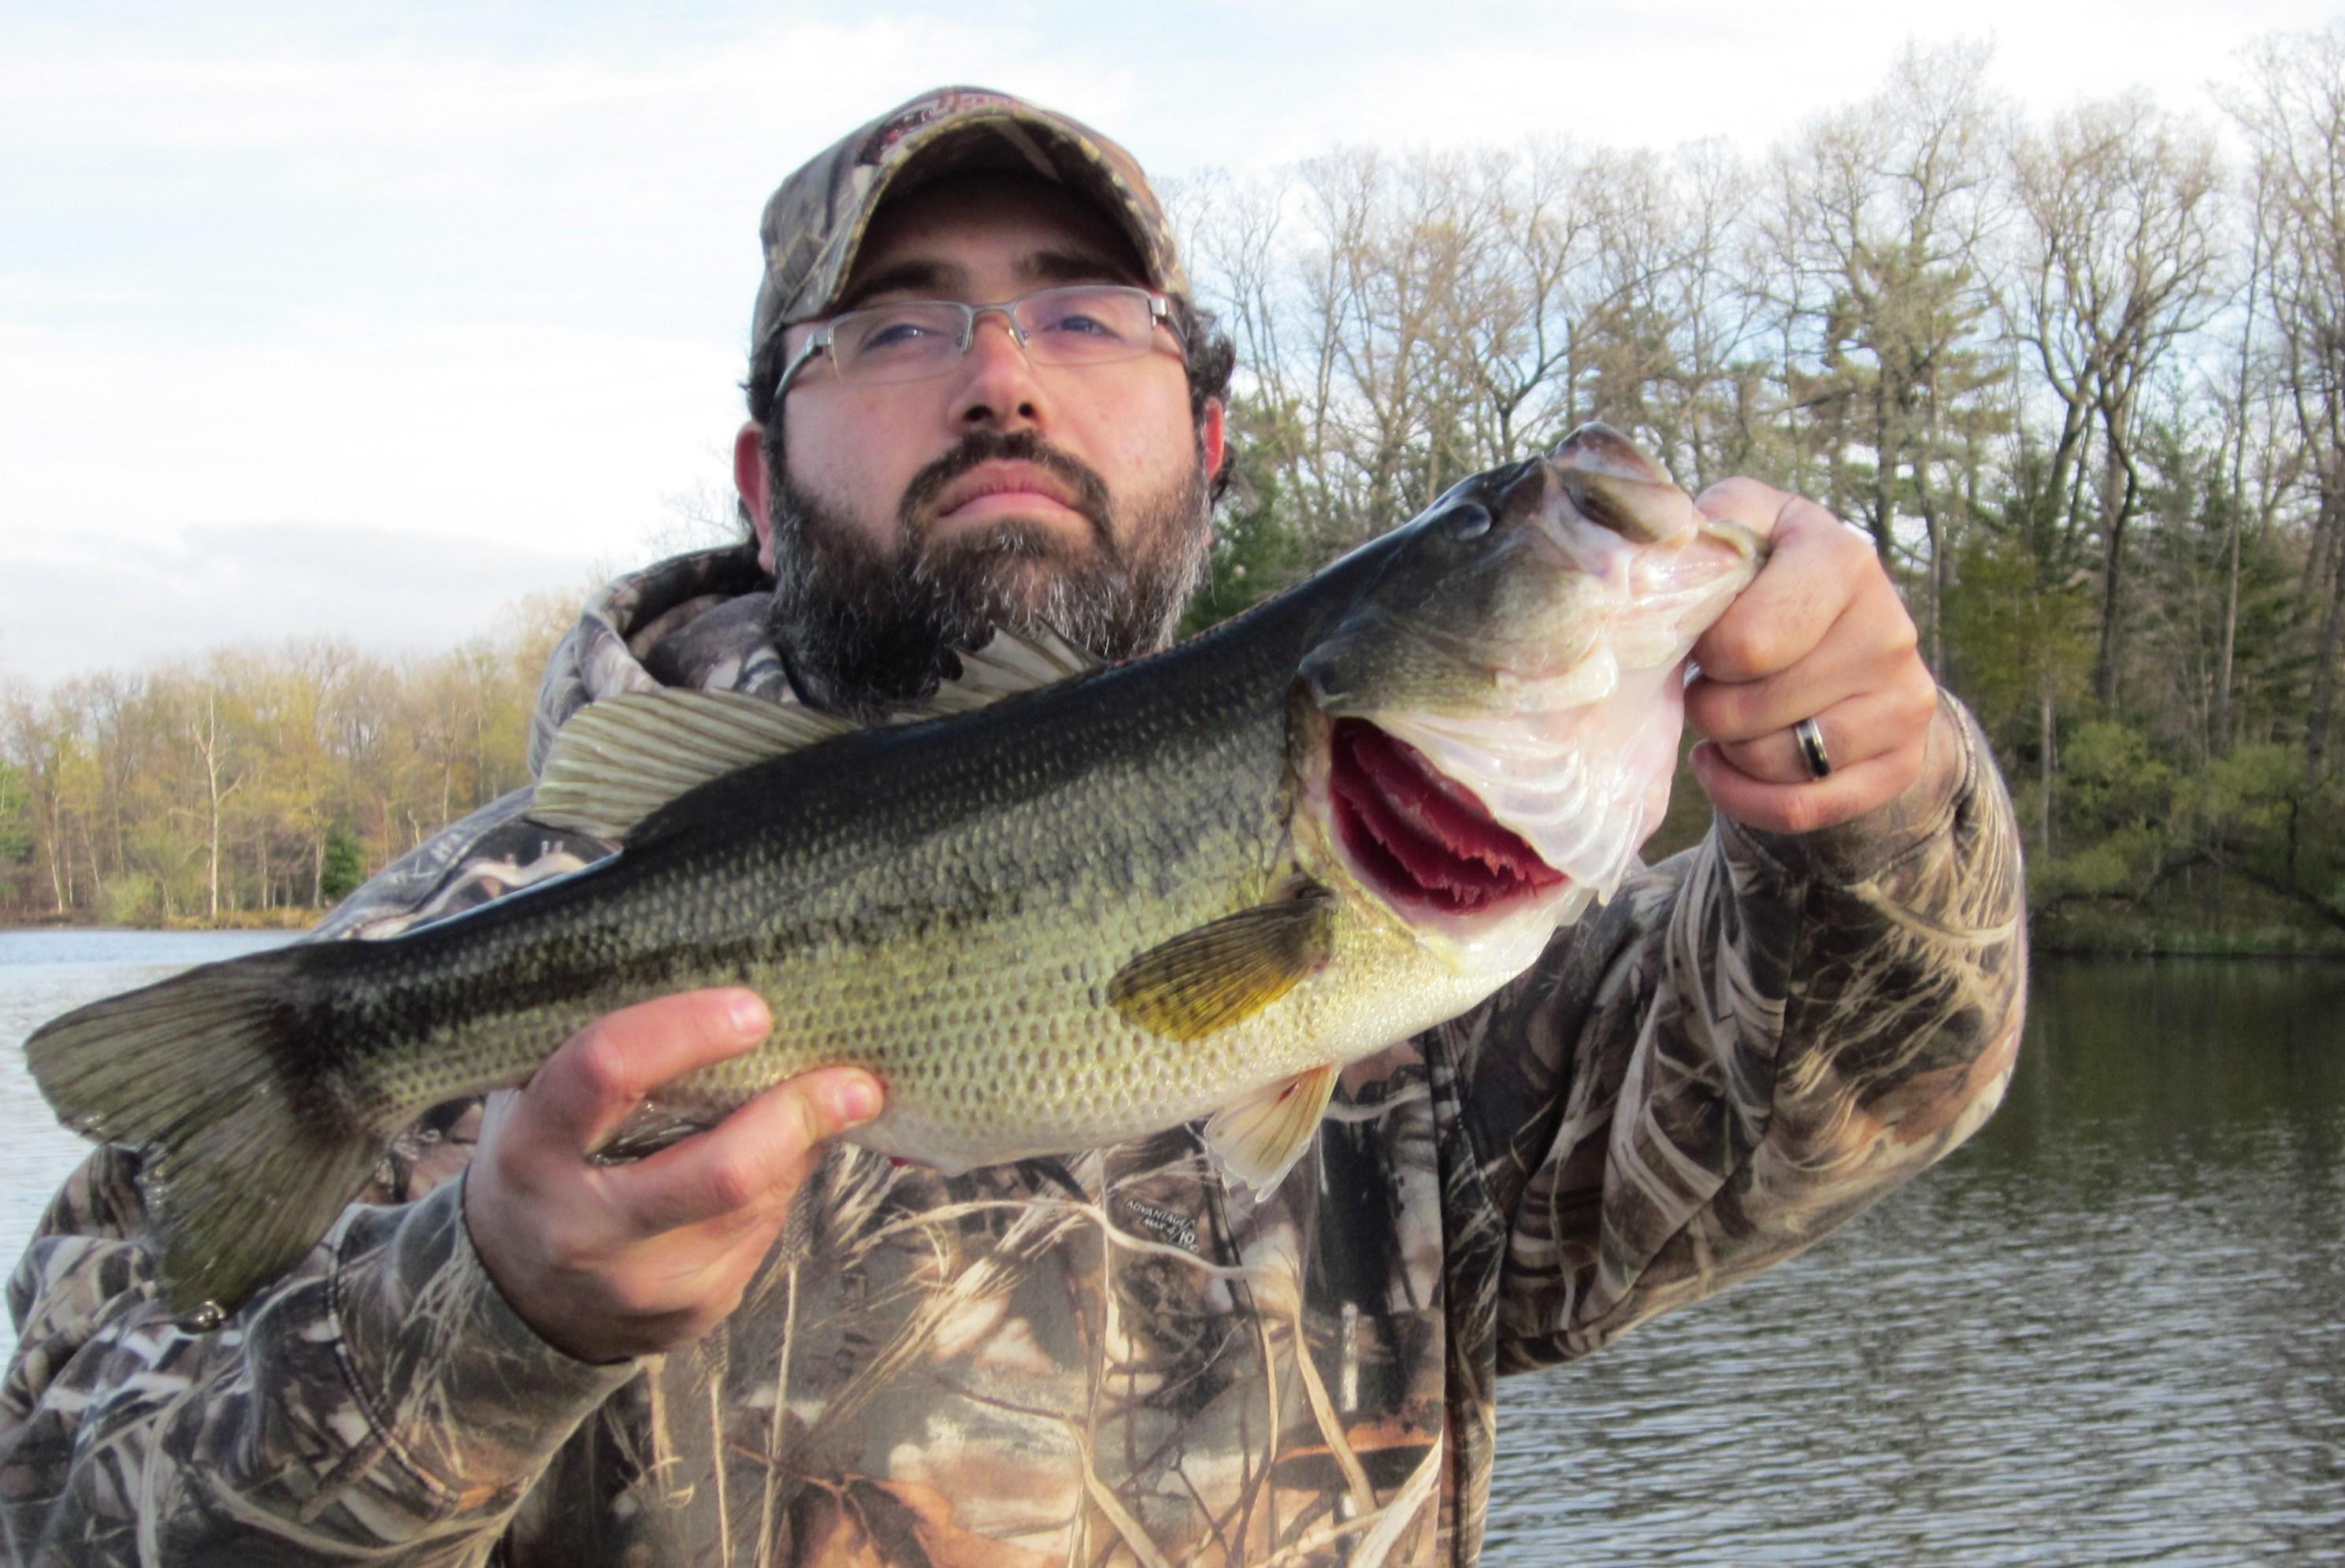 Big bass hunt ducks hook fish for Big bass fishing